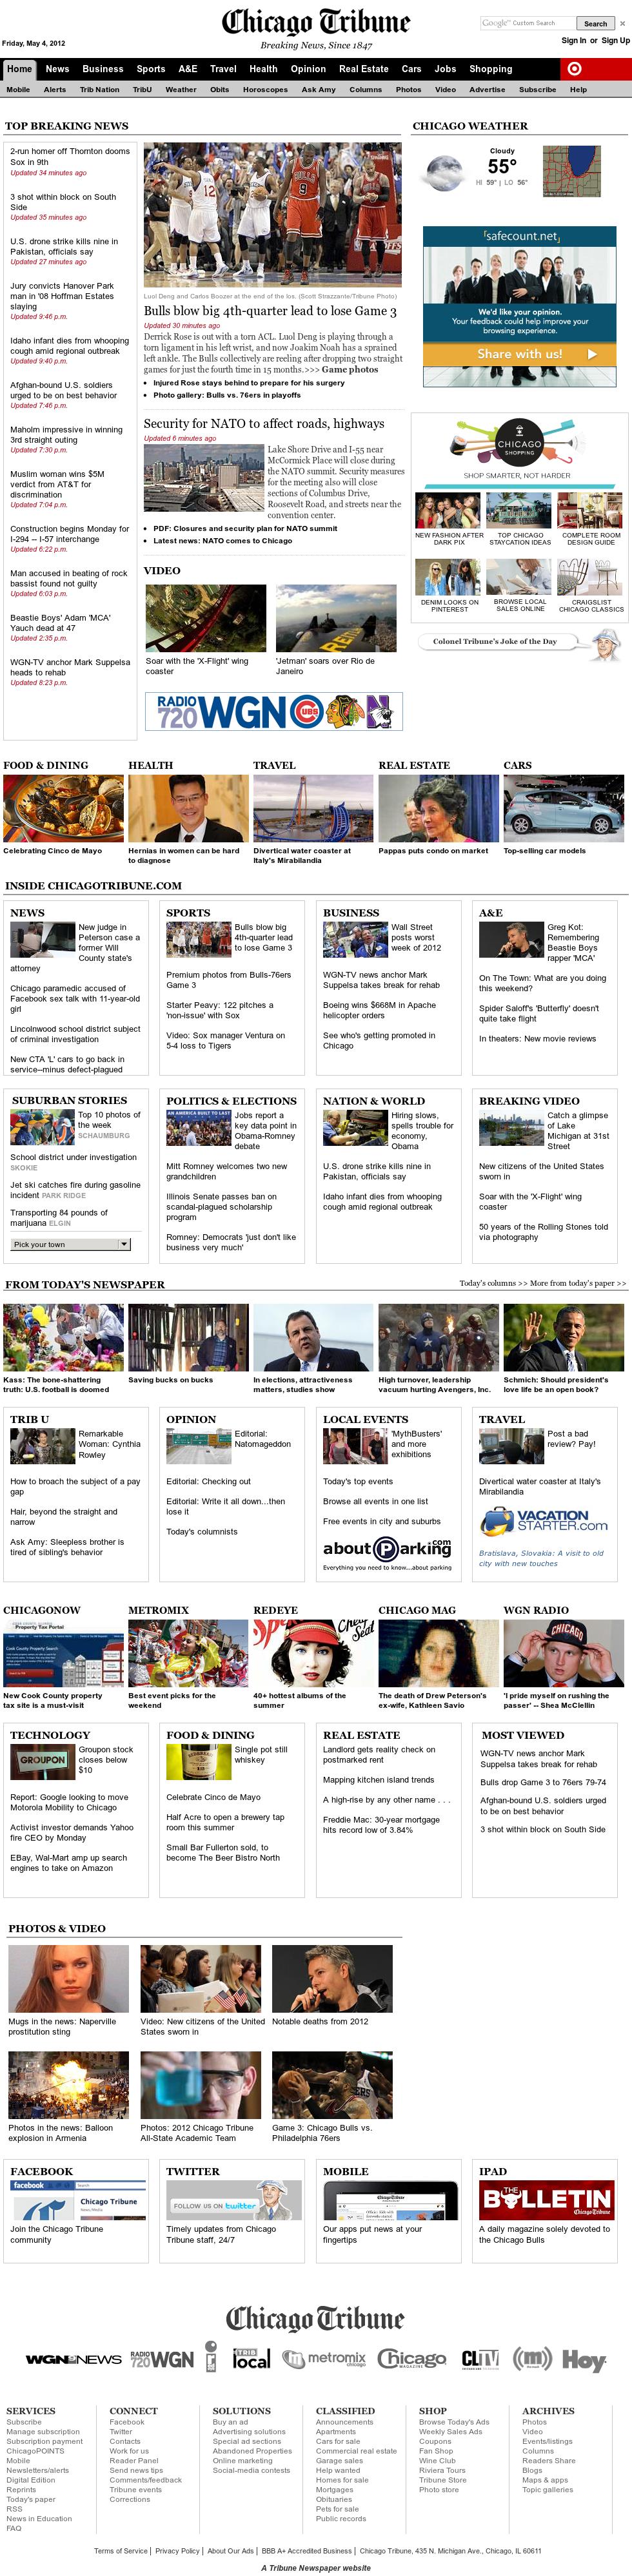 Chicago Tribune at Saturday May 5, 2012, 4:01 a.m. UTC